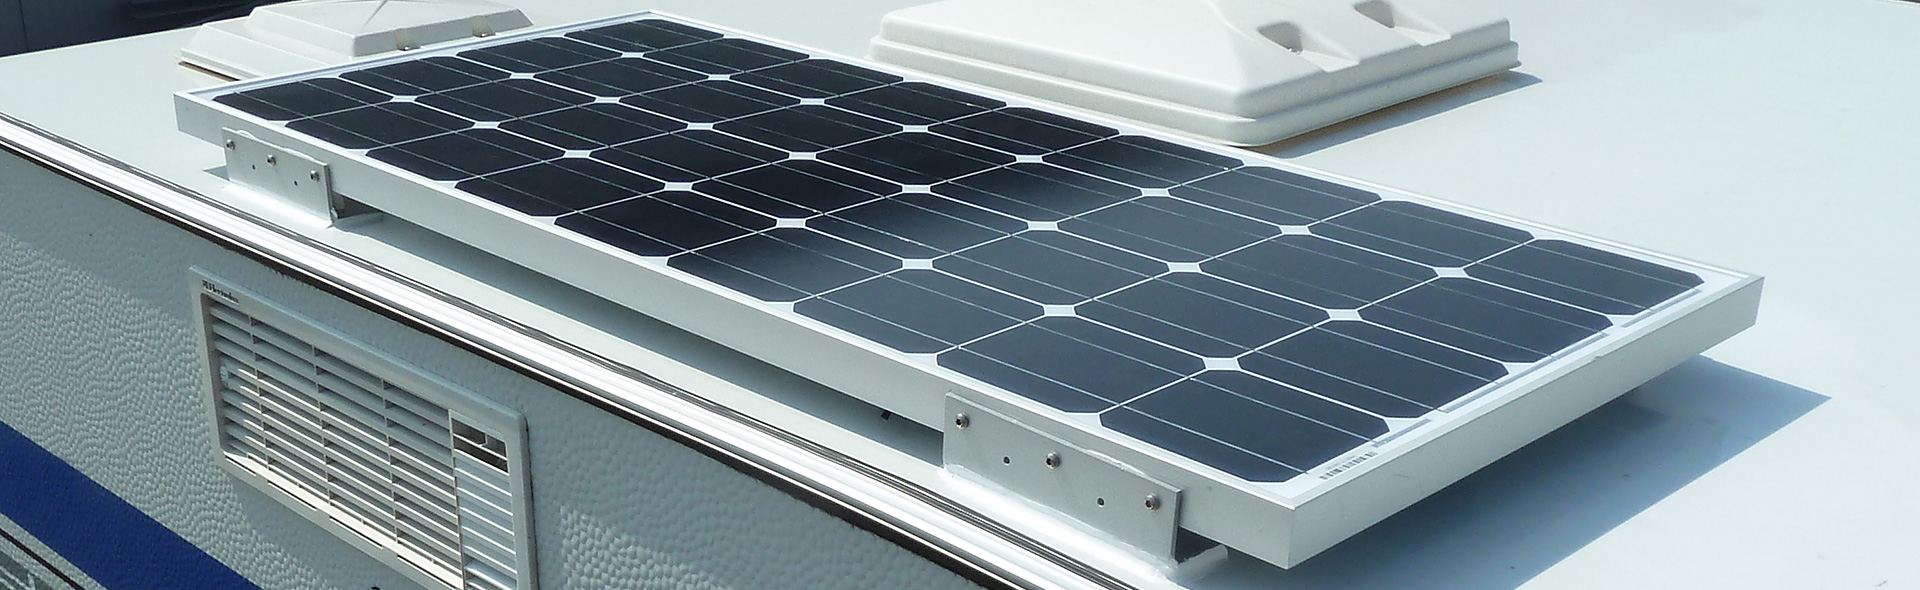 200w 12v Solar Spar Set Für Kastenfahrzeuge Komplett Solaranlage 200 Watt Top Spezielle Fahrzeug-teile Elektro- & Sat-technik